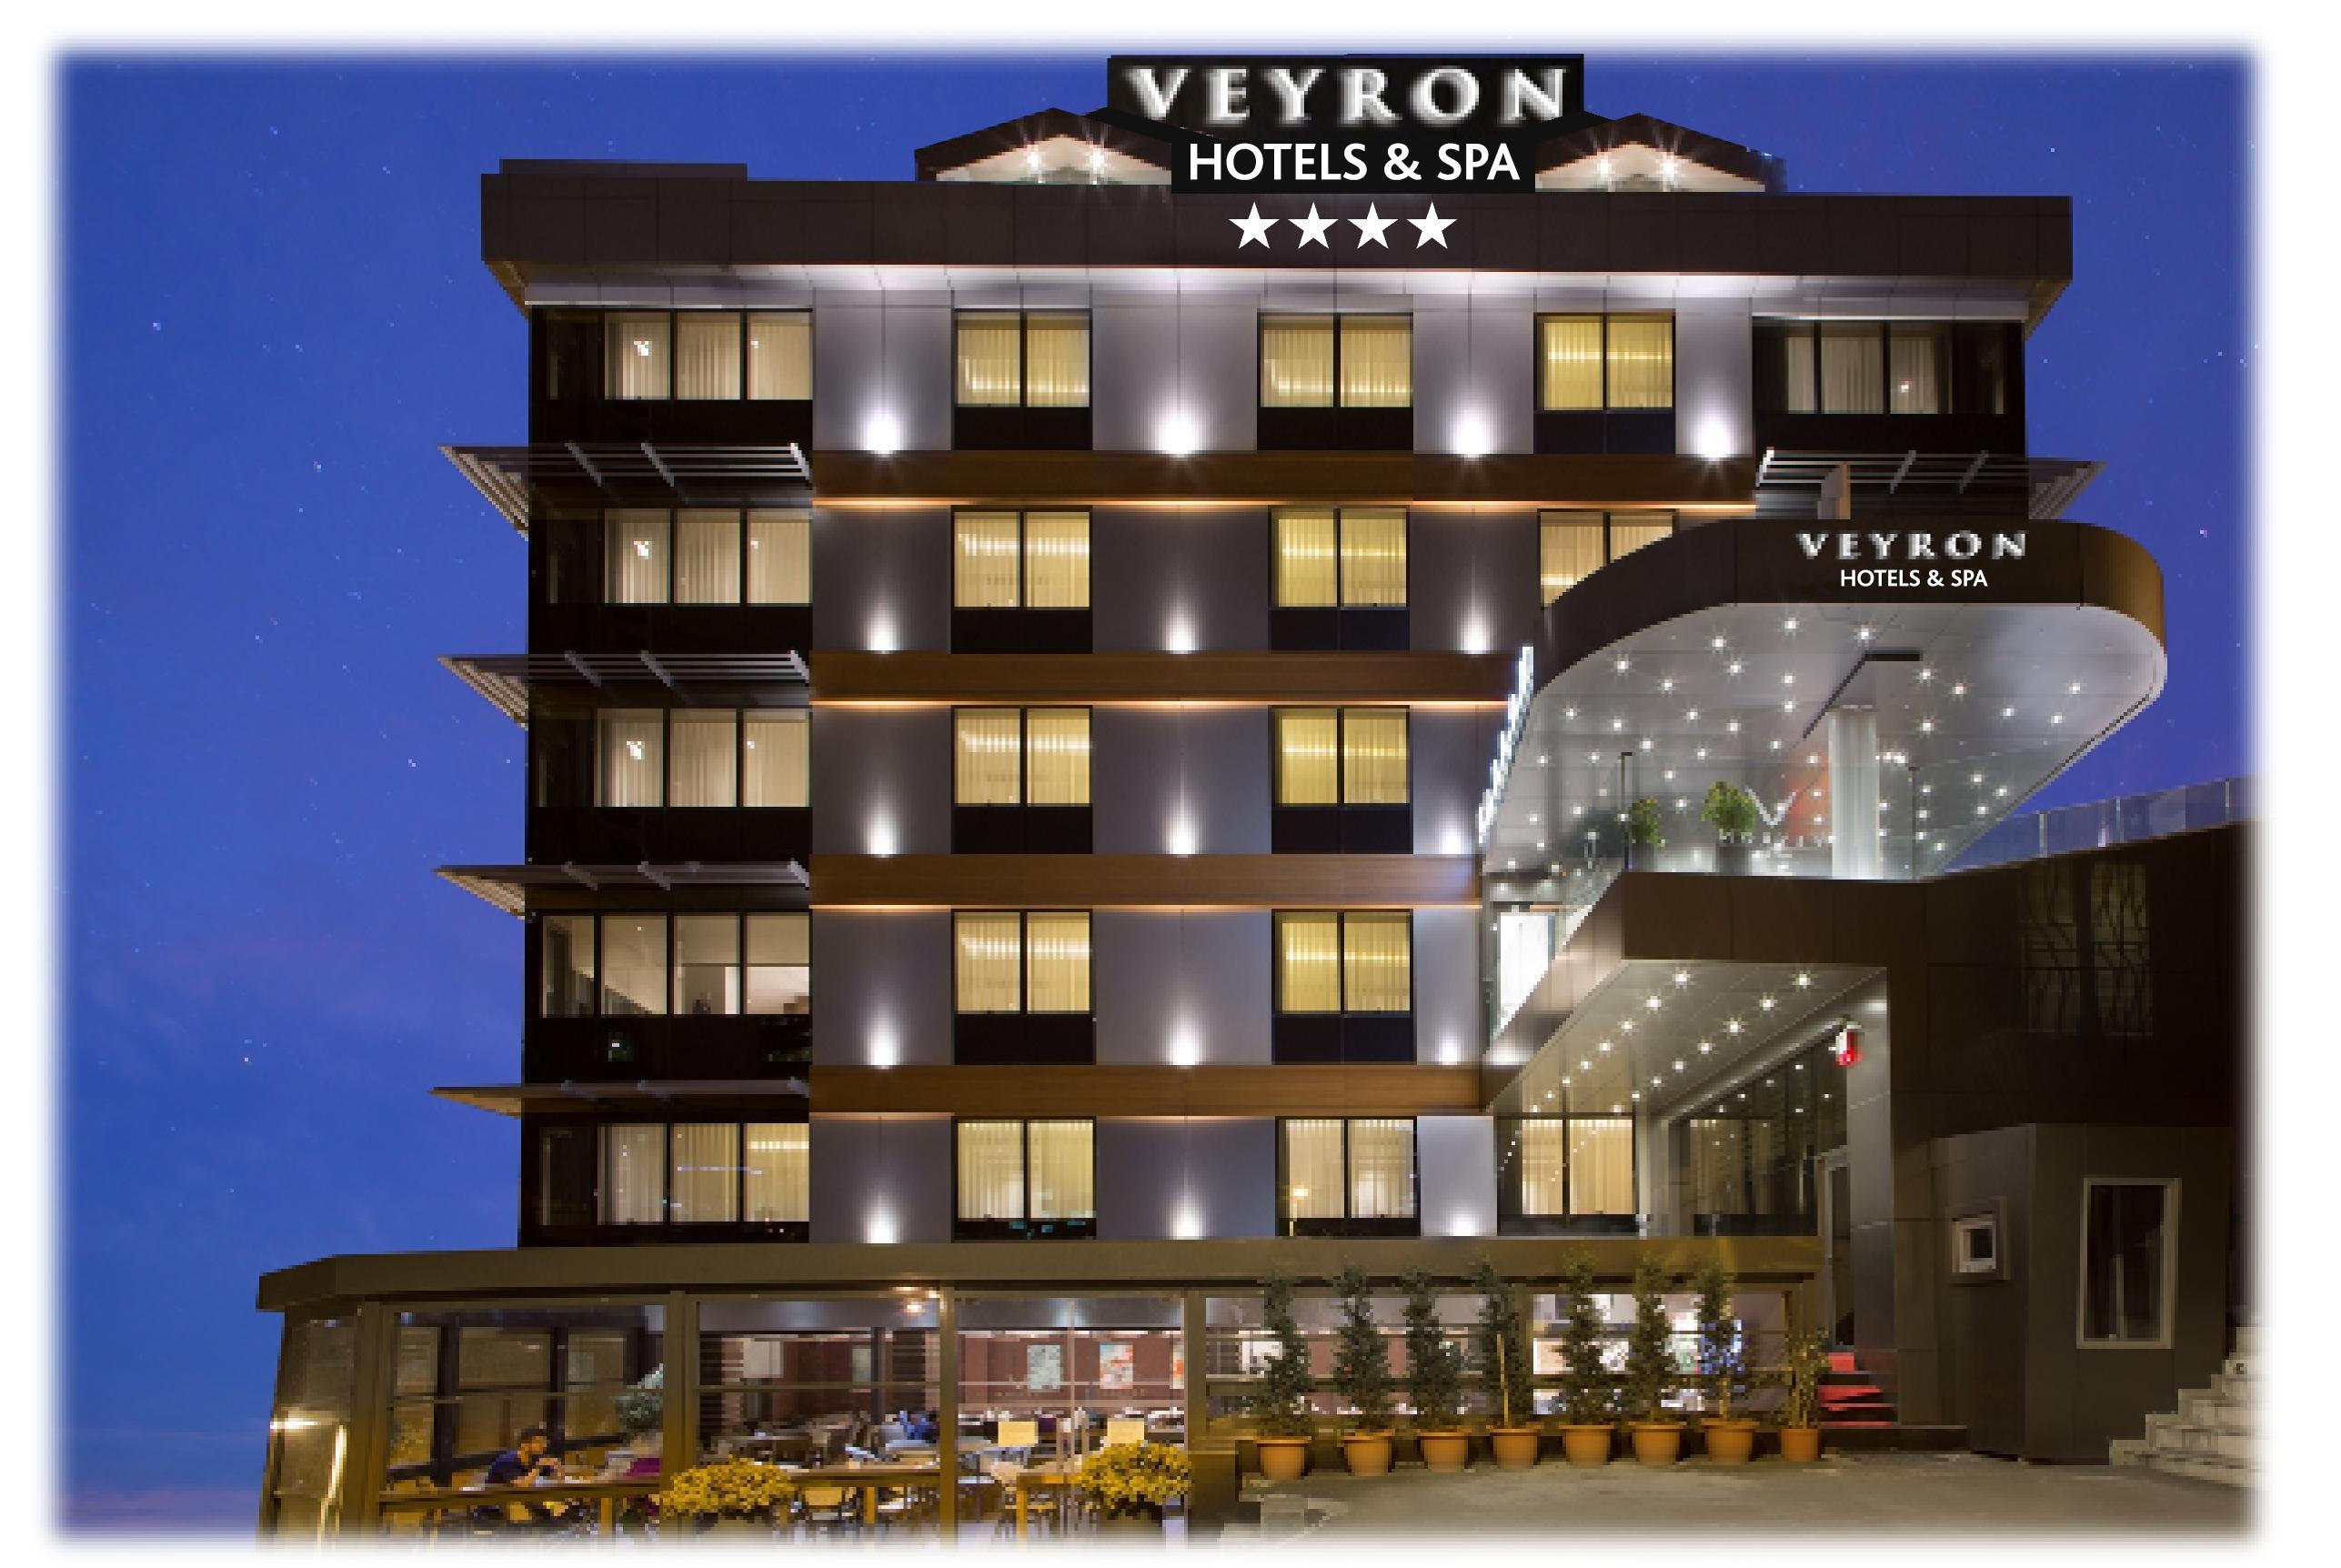 Veyron Hotels & Spa, Beşiktaş